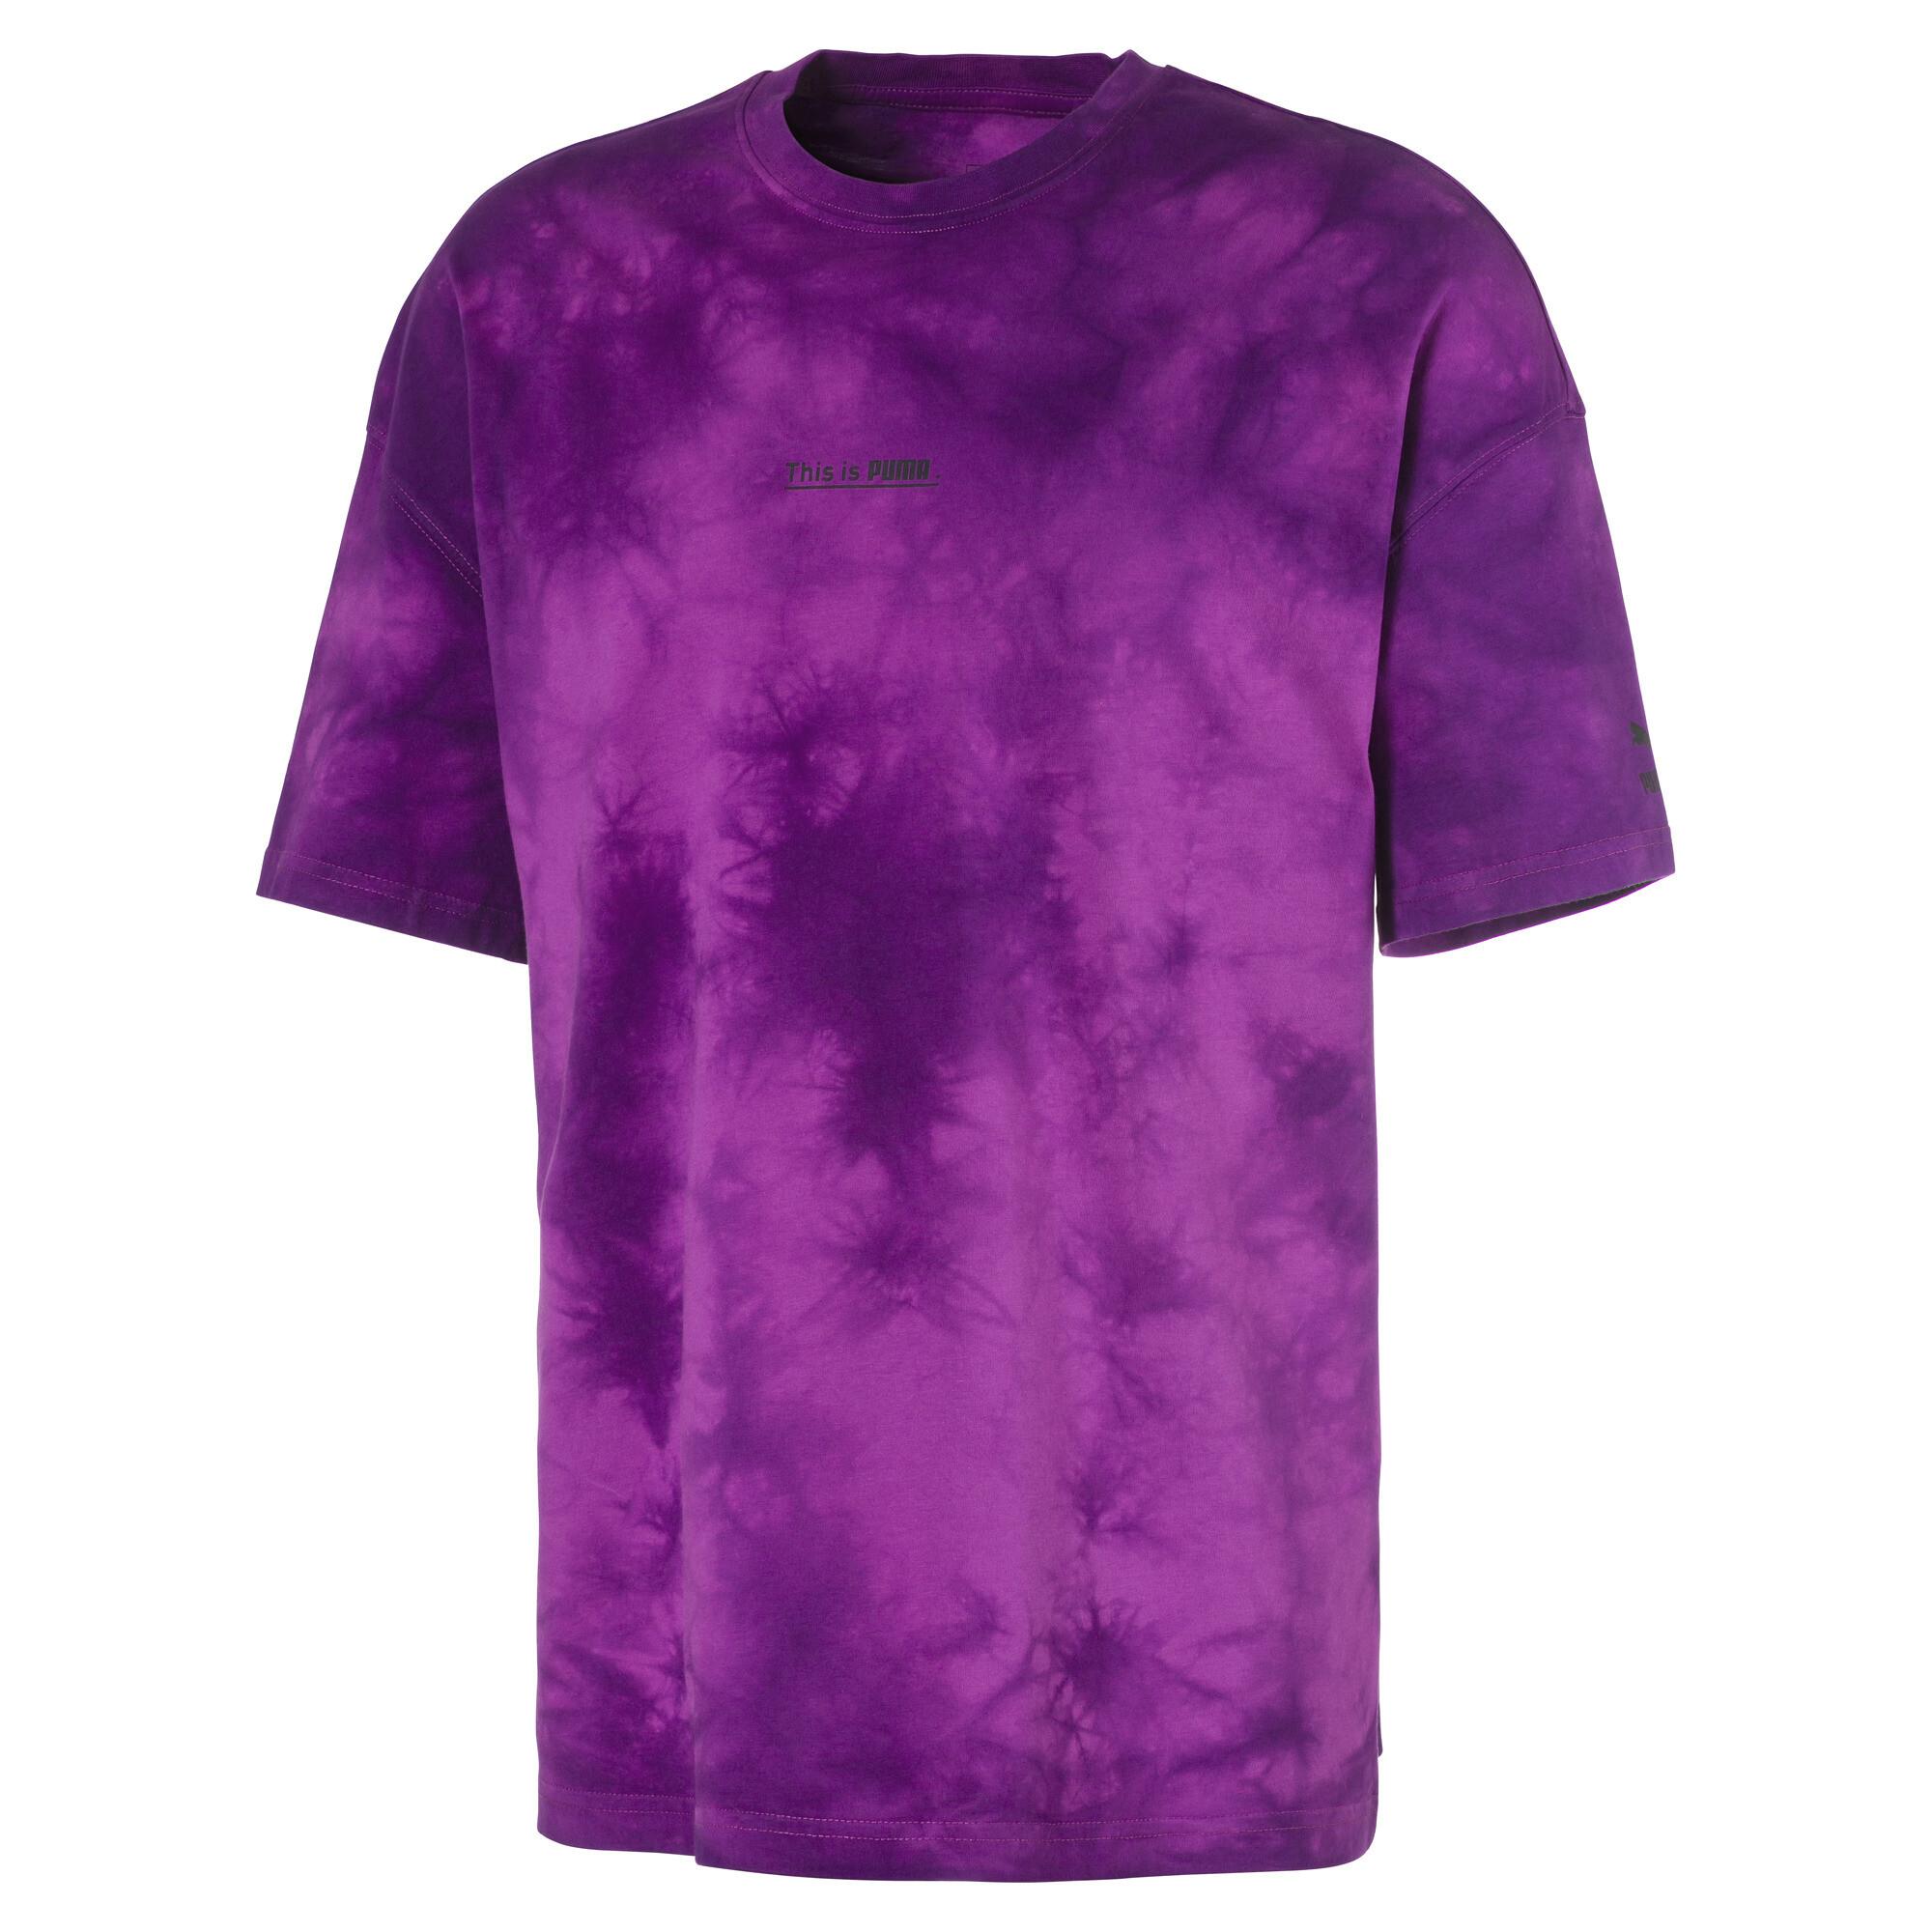 PUMA-Boxy-Herren-T-Shirt-Maenner-T-Shirt-Neu Indexbild 14